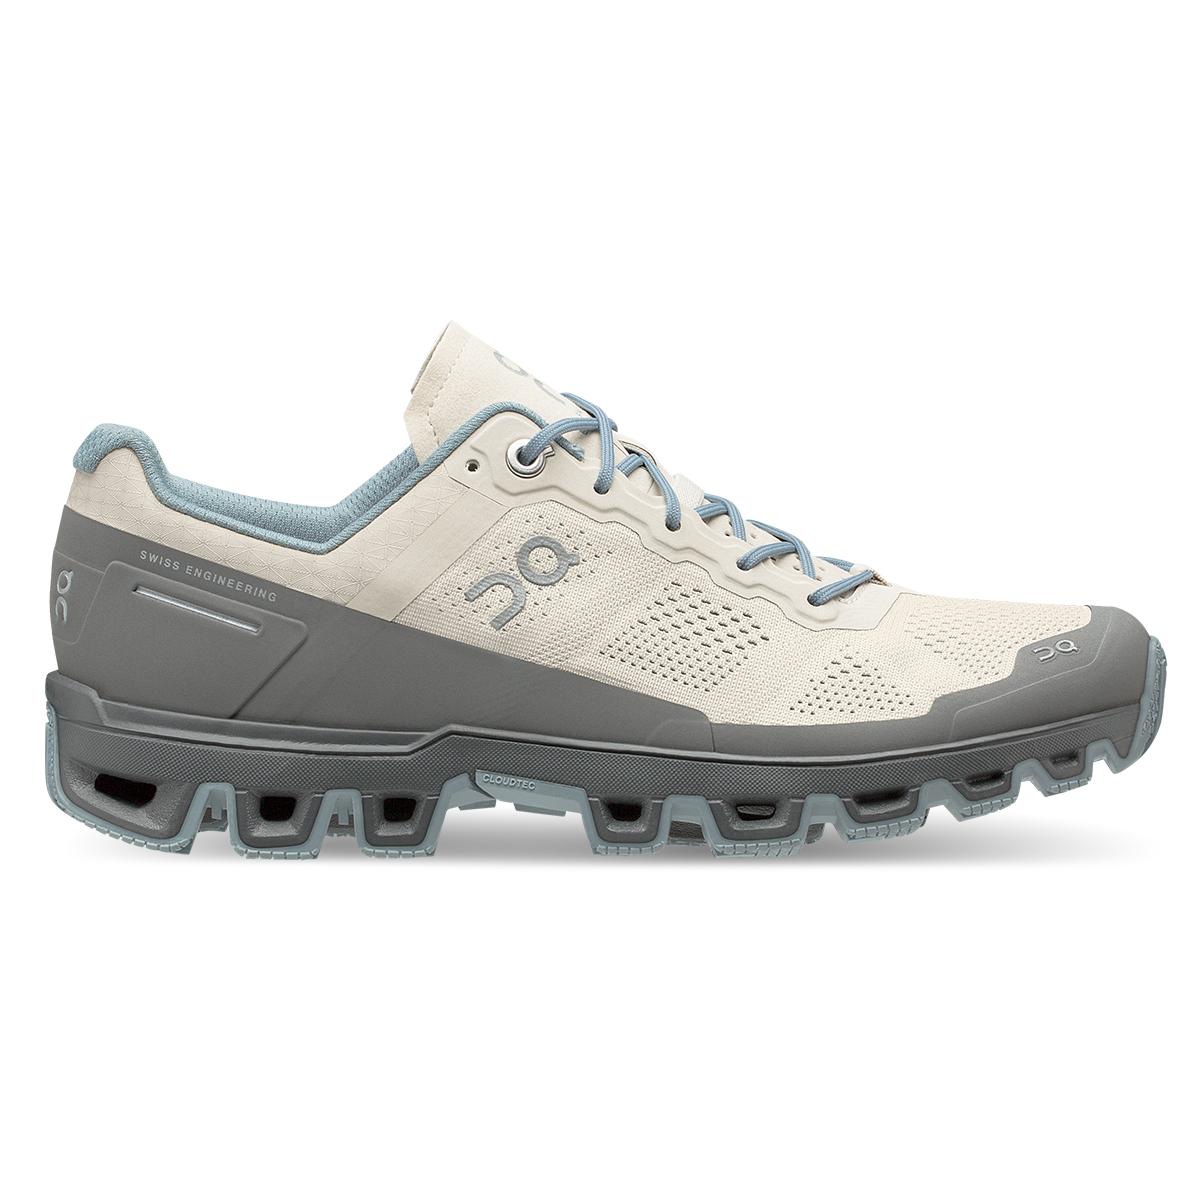 Women's On Cloudventure Trail Running Shoe - Color: Sand/Wash - Size: 5 - Width: Regular, Sand/Wash, large, image 1